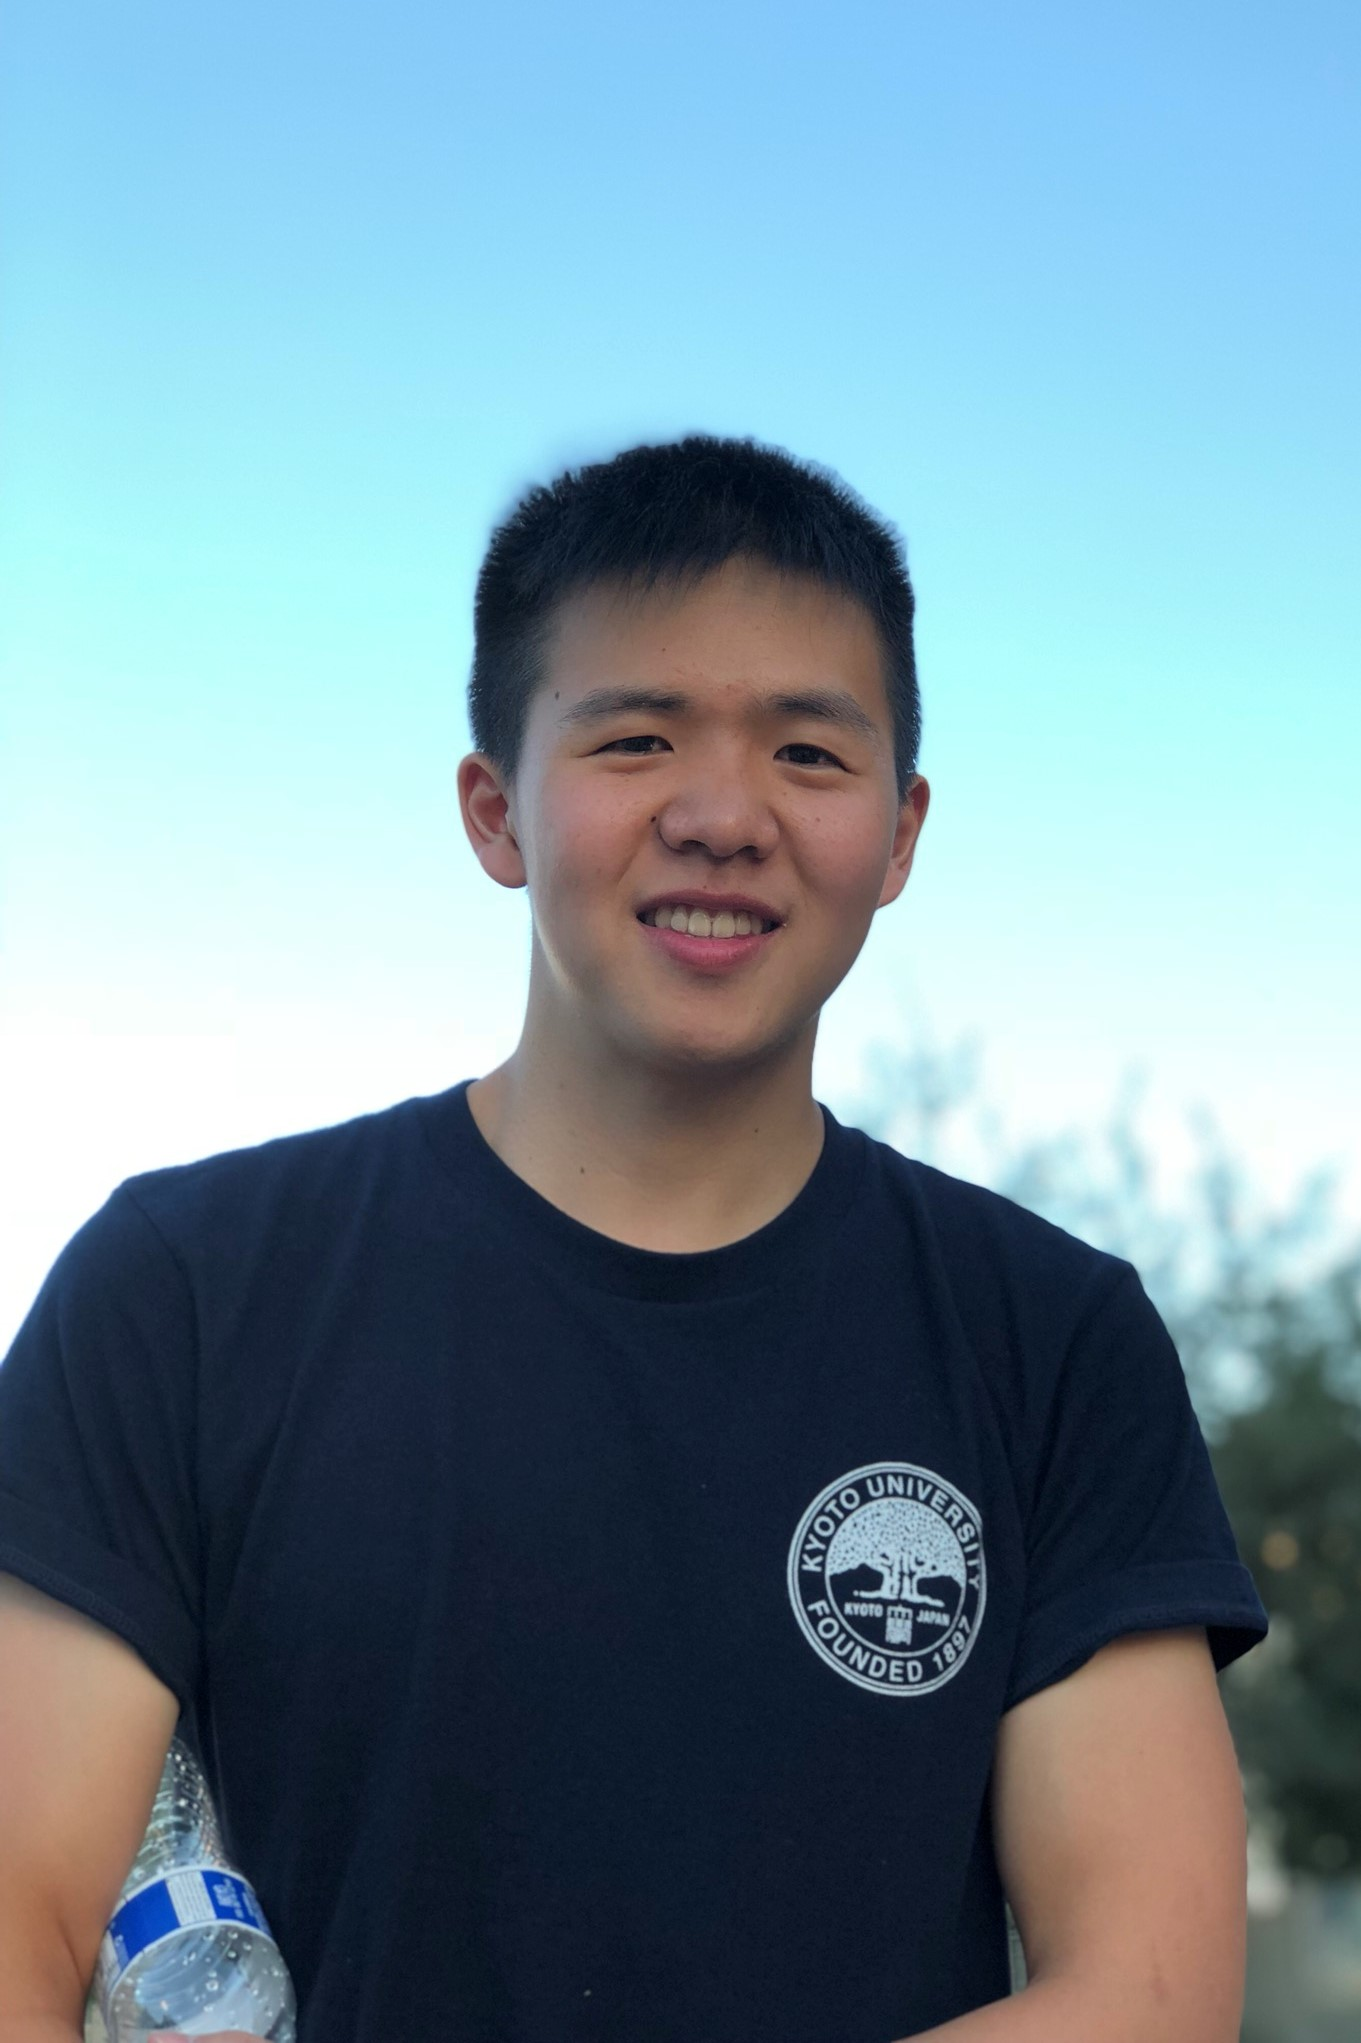 Lawrence Tsai - Active Brother